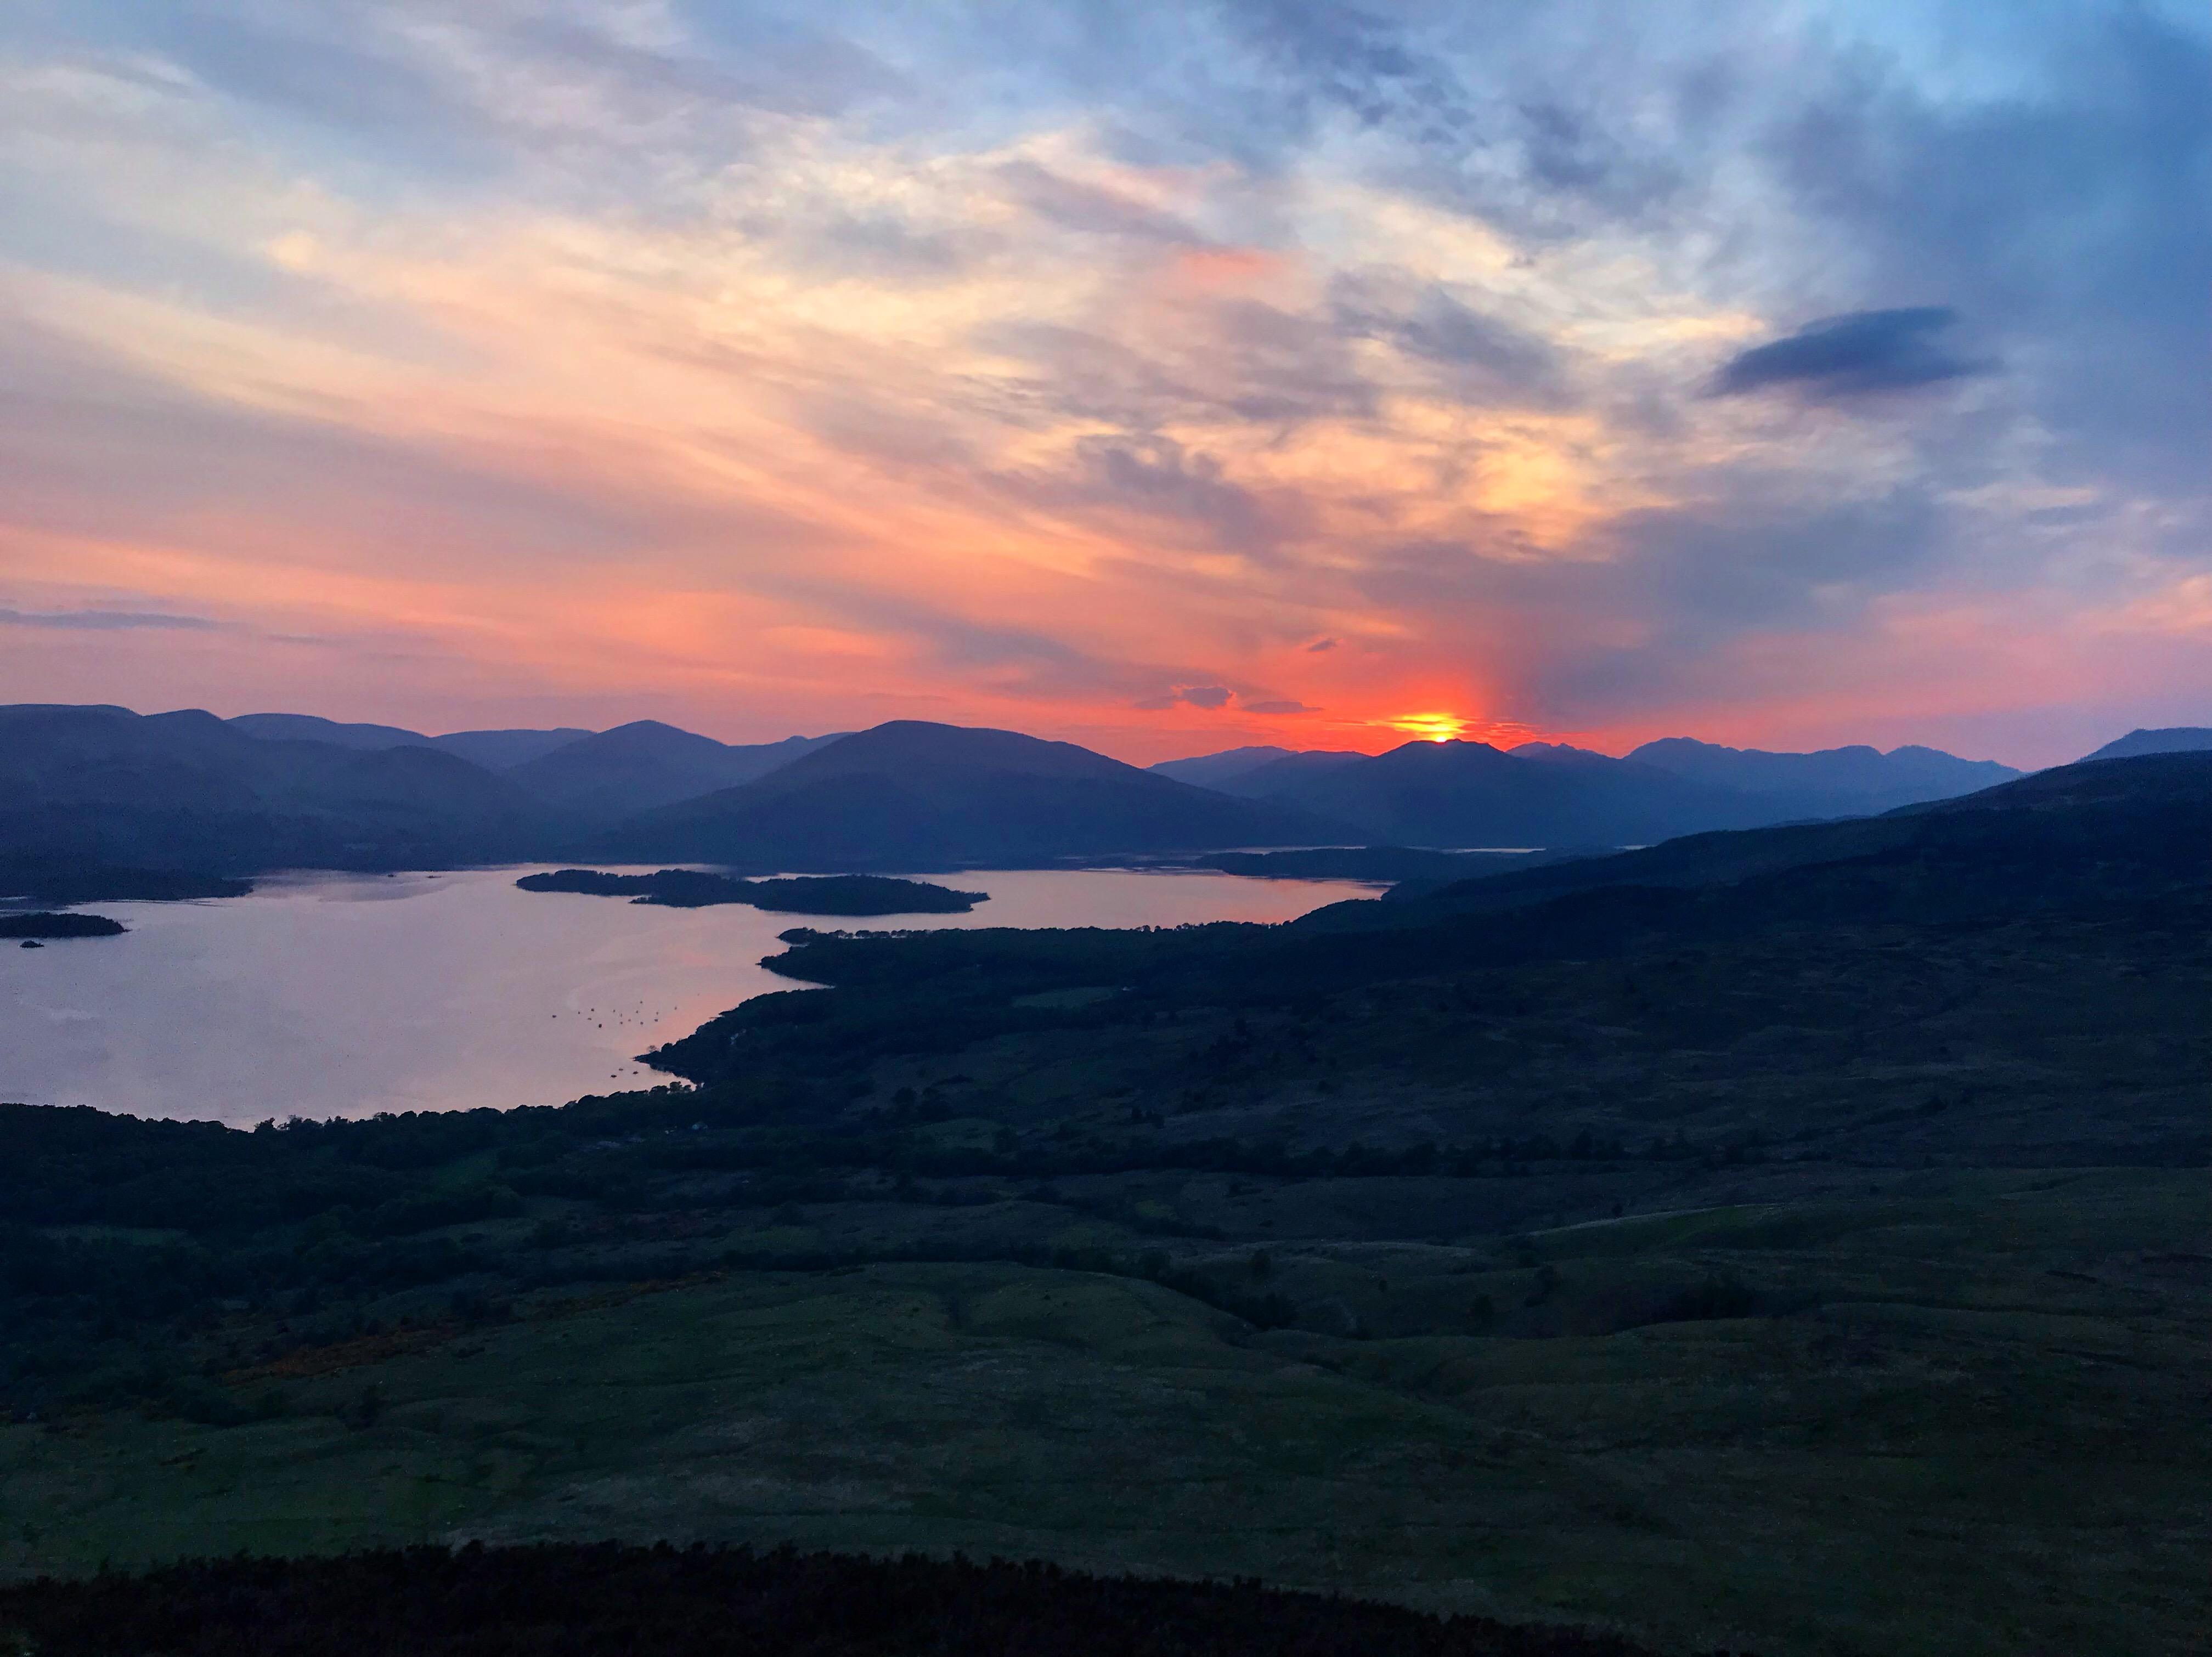 Loch Lomond at sunset